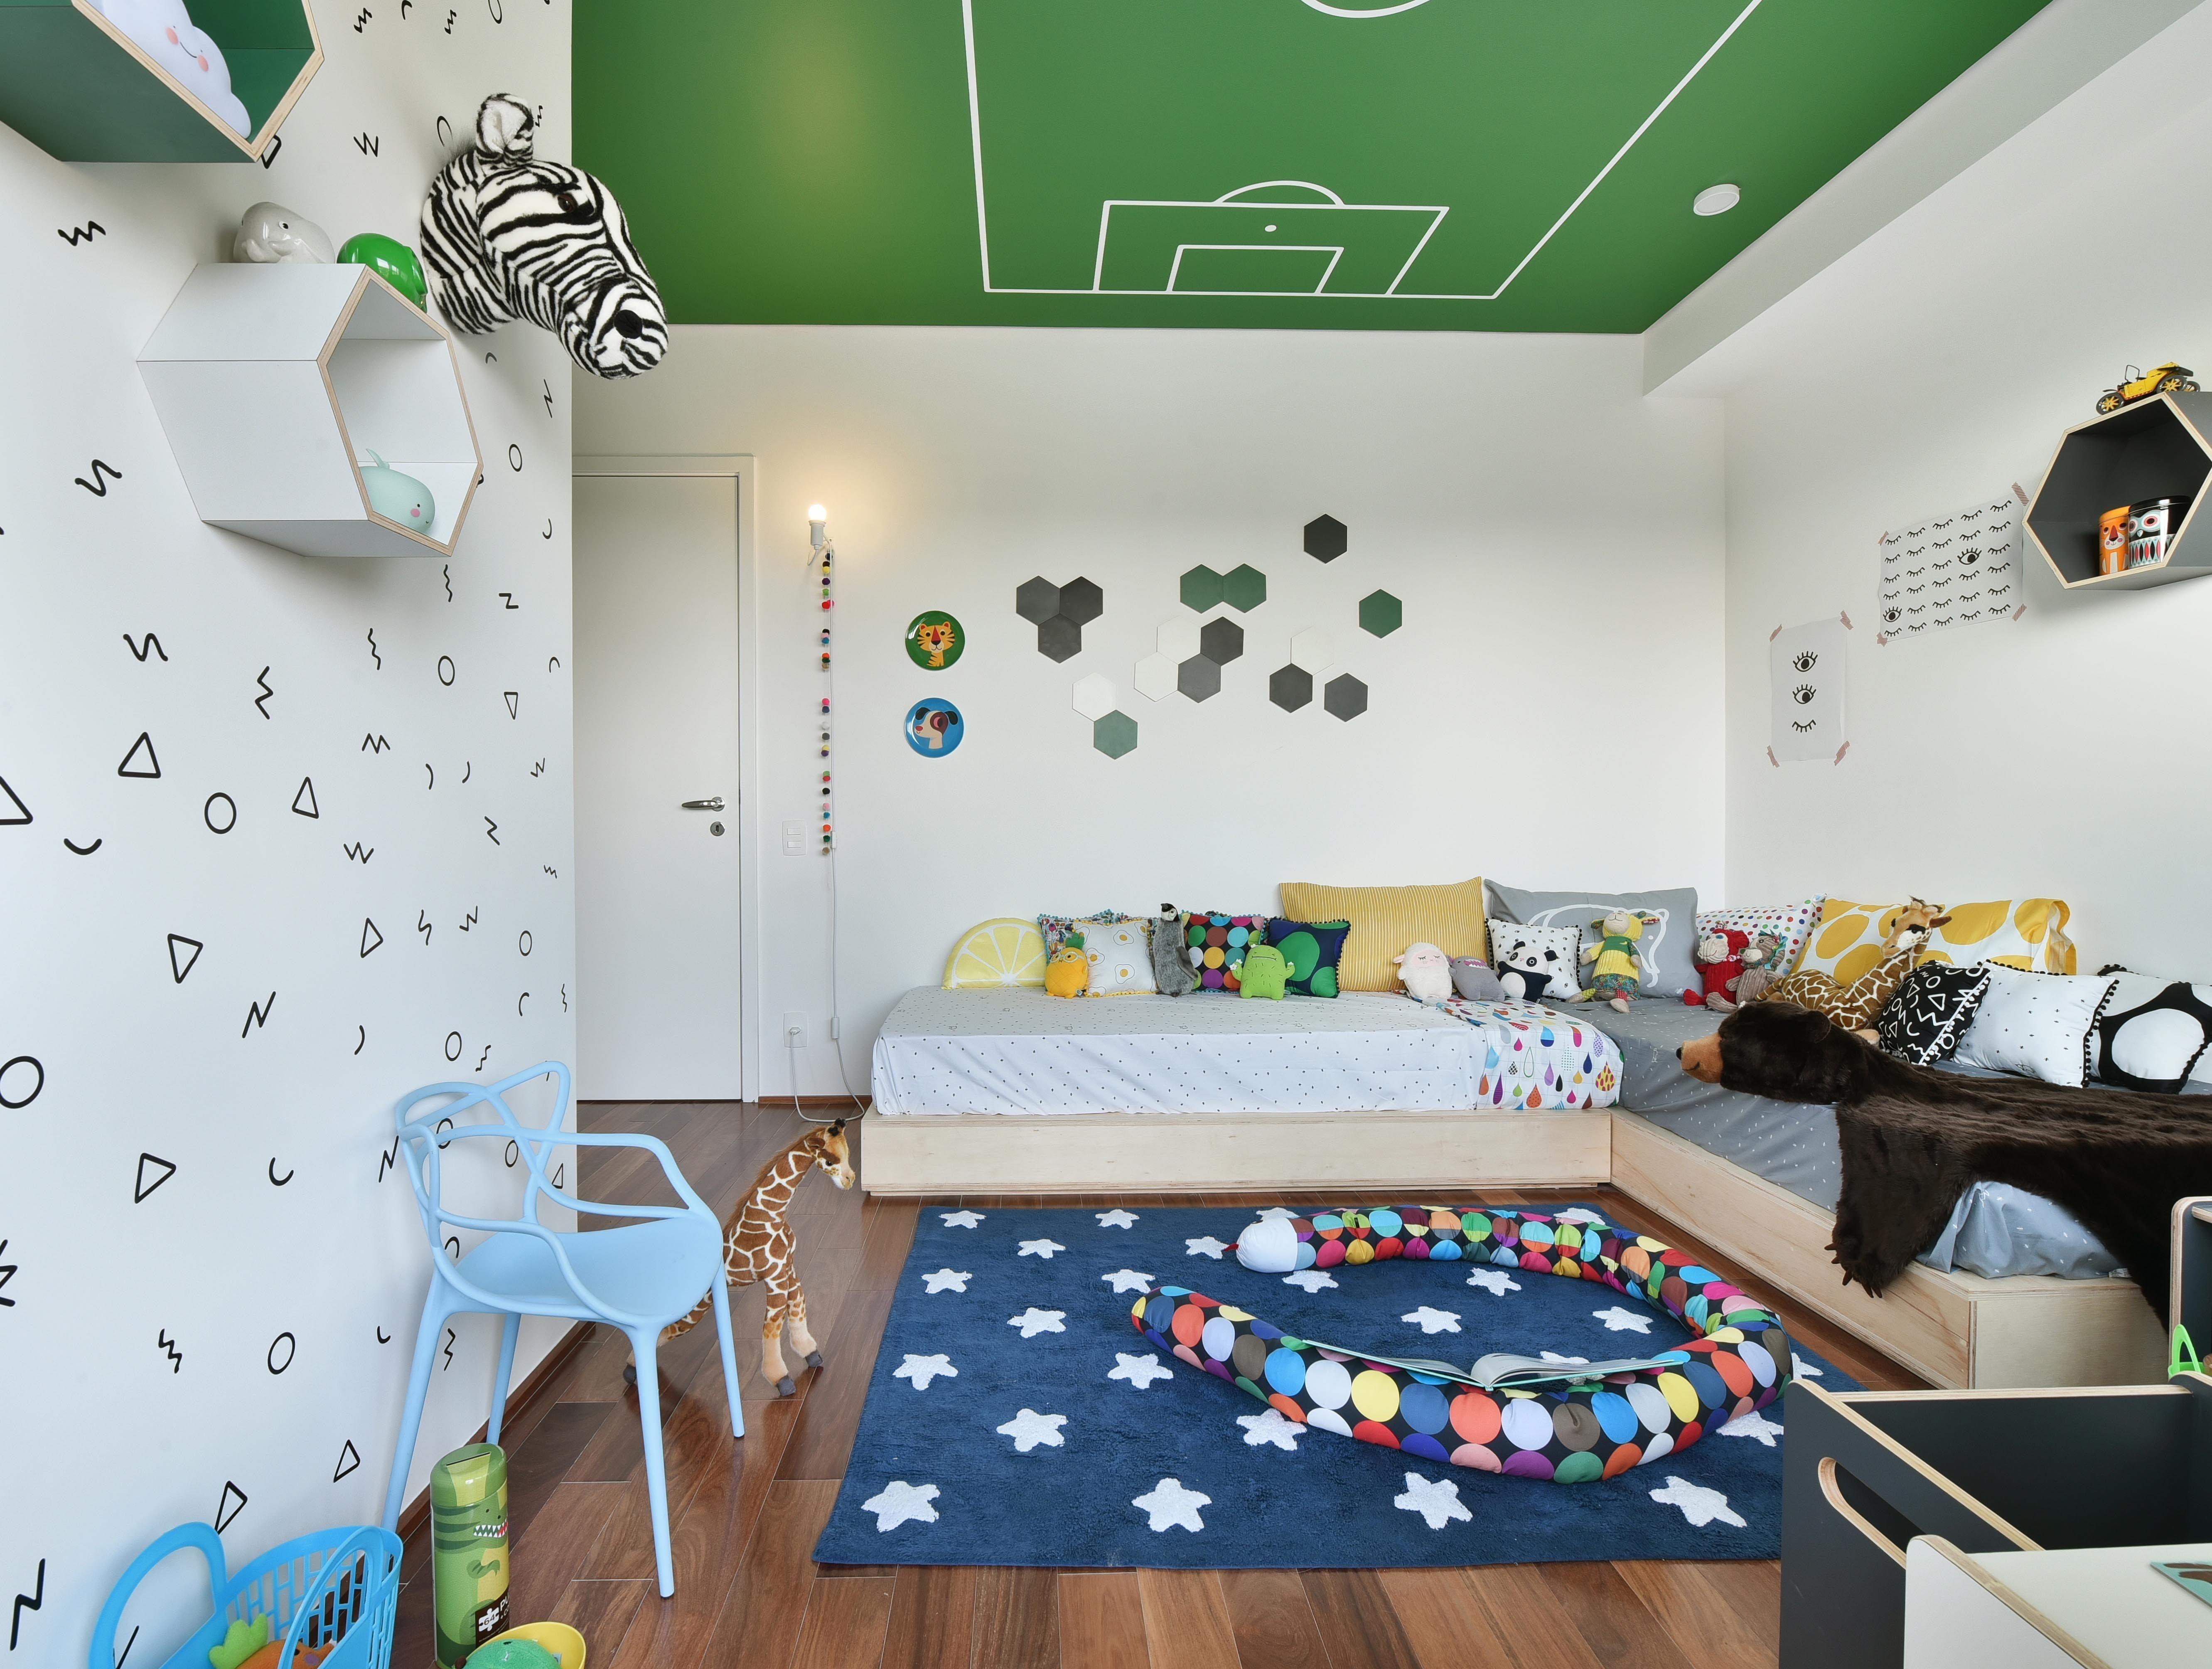 Kids Room Decor   Kids Space Interior   Kids Nooks   Kids Room Decorations    Fun